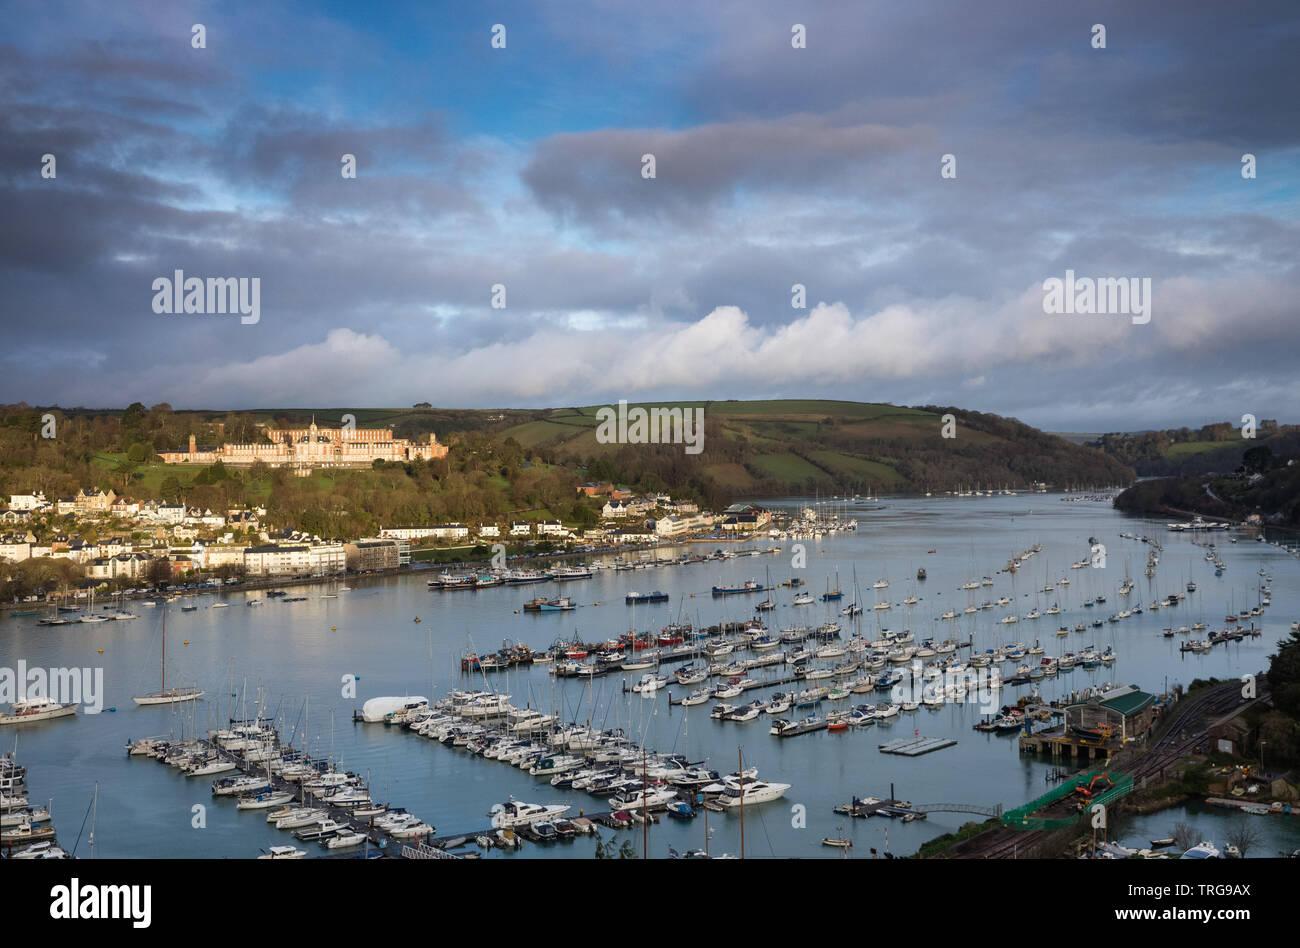 The Royal Naval College Brittania  and the Dart Estuary, Dartmouth, Devon, England, UK Stock Photo